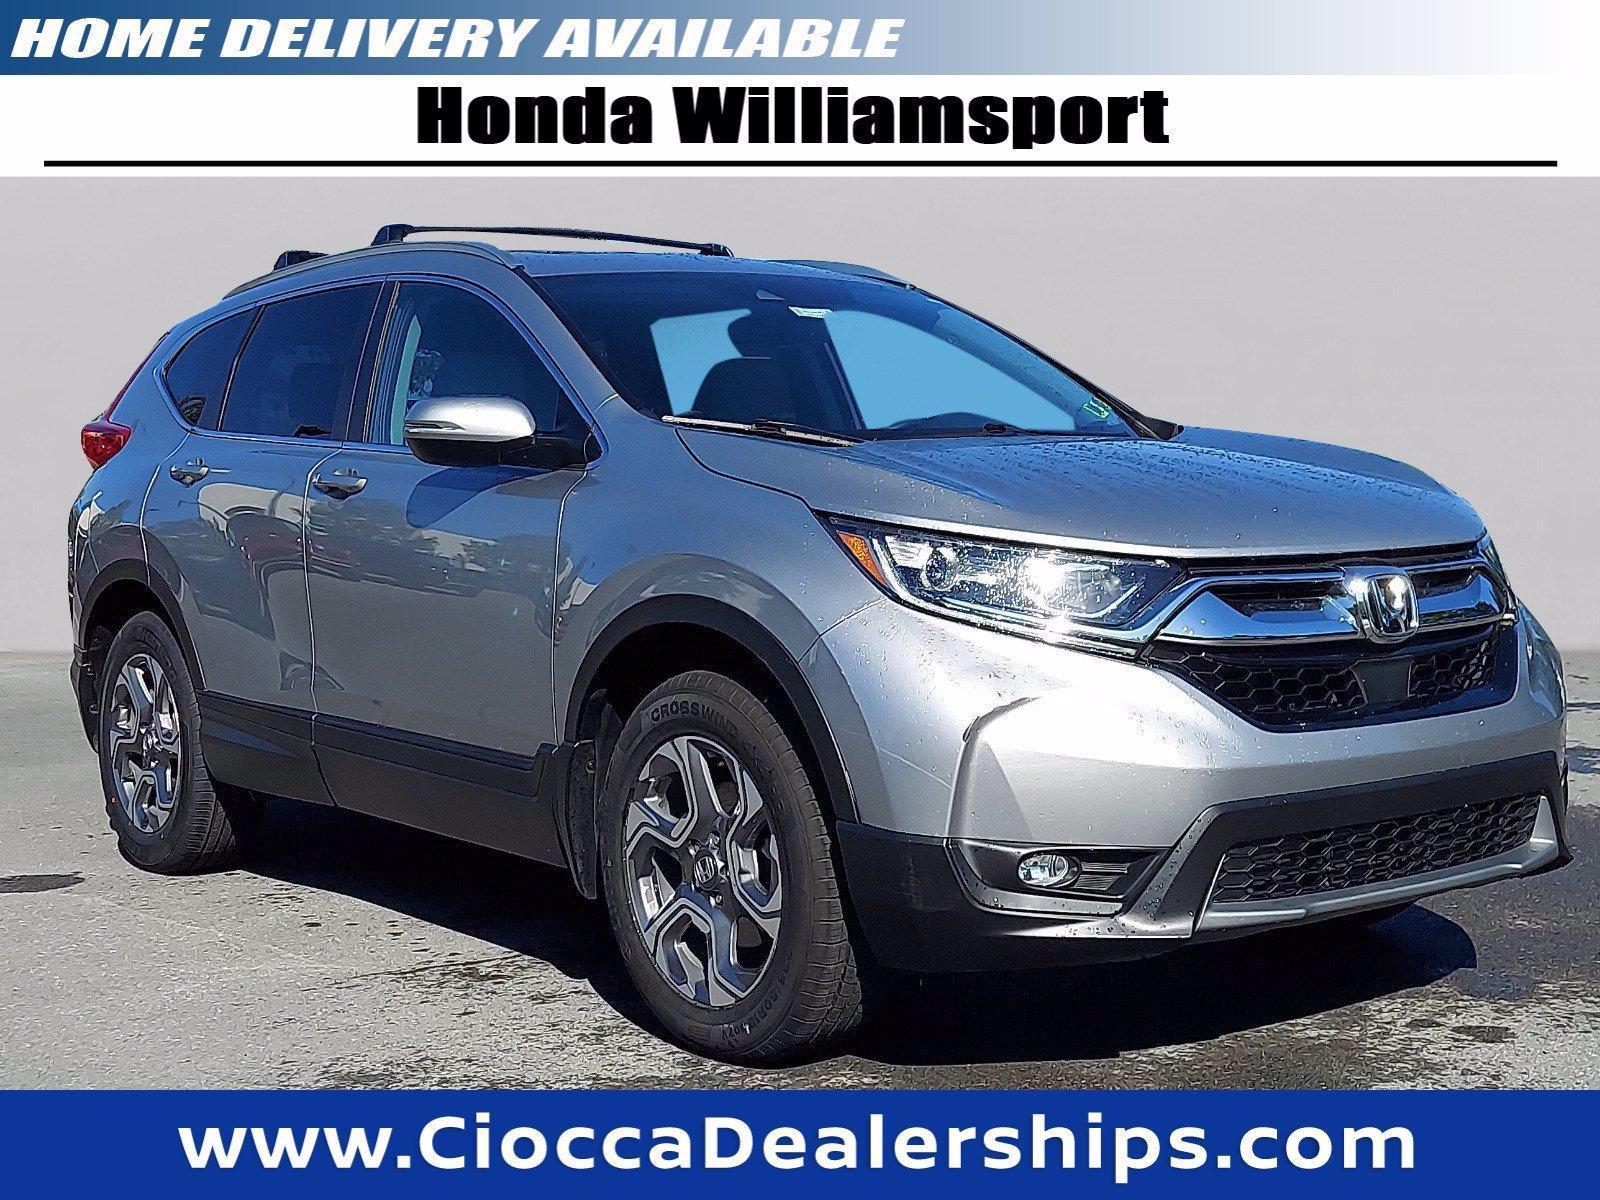 2017 Honda CR-V Vehicle Photo in Muncy, PA 17756